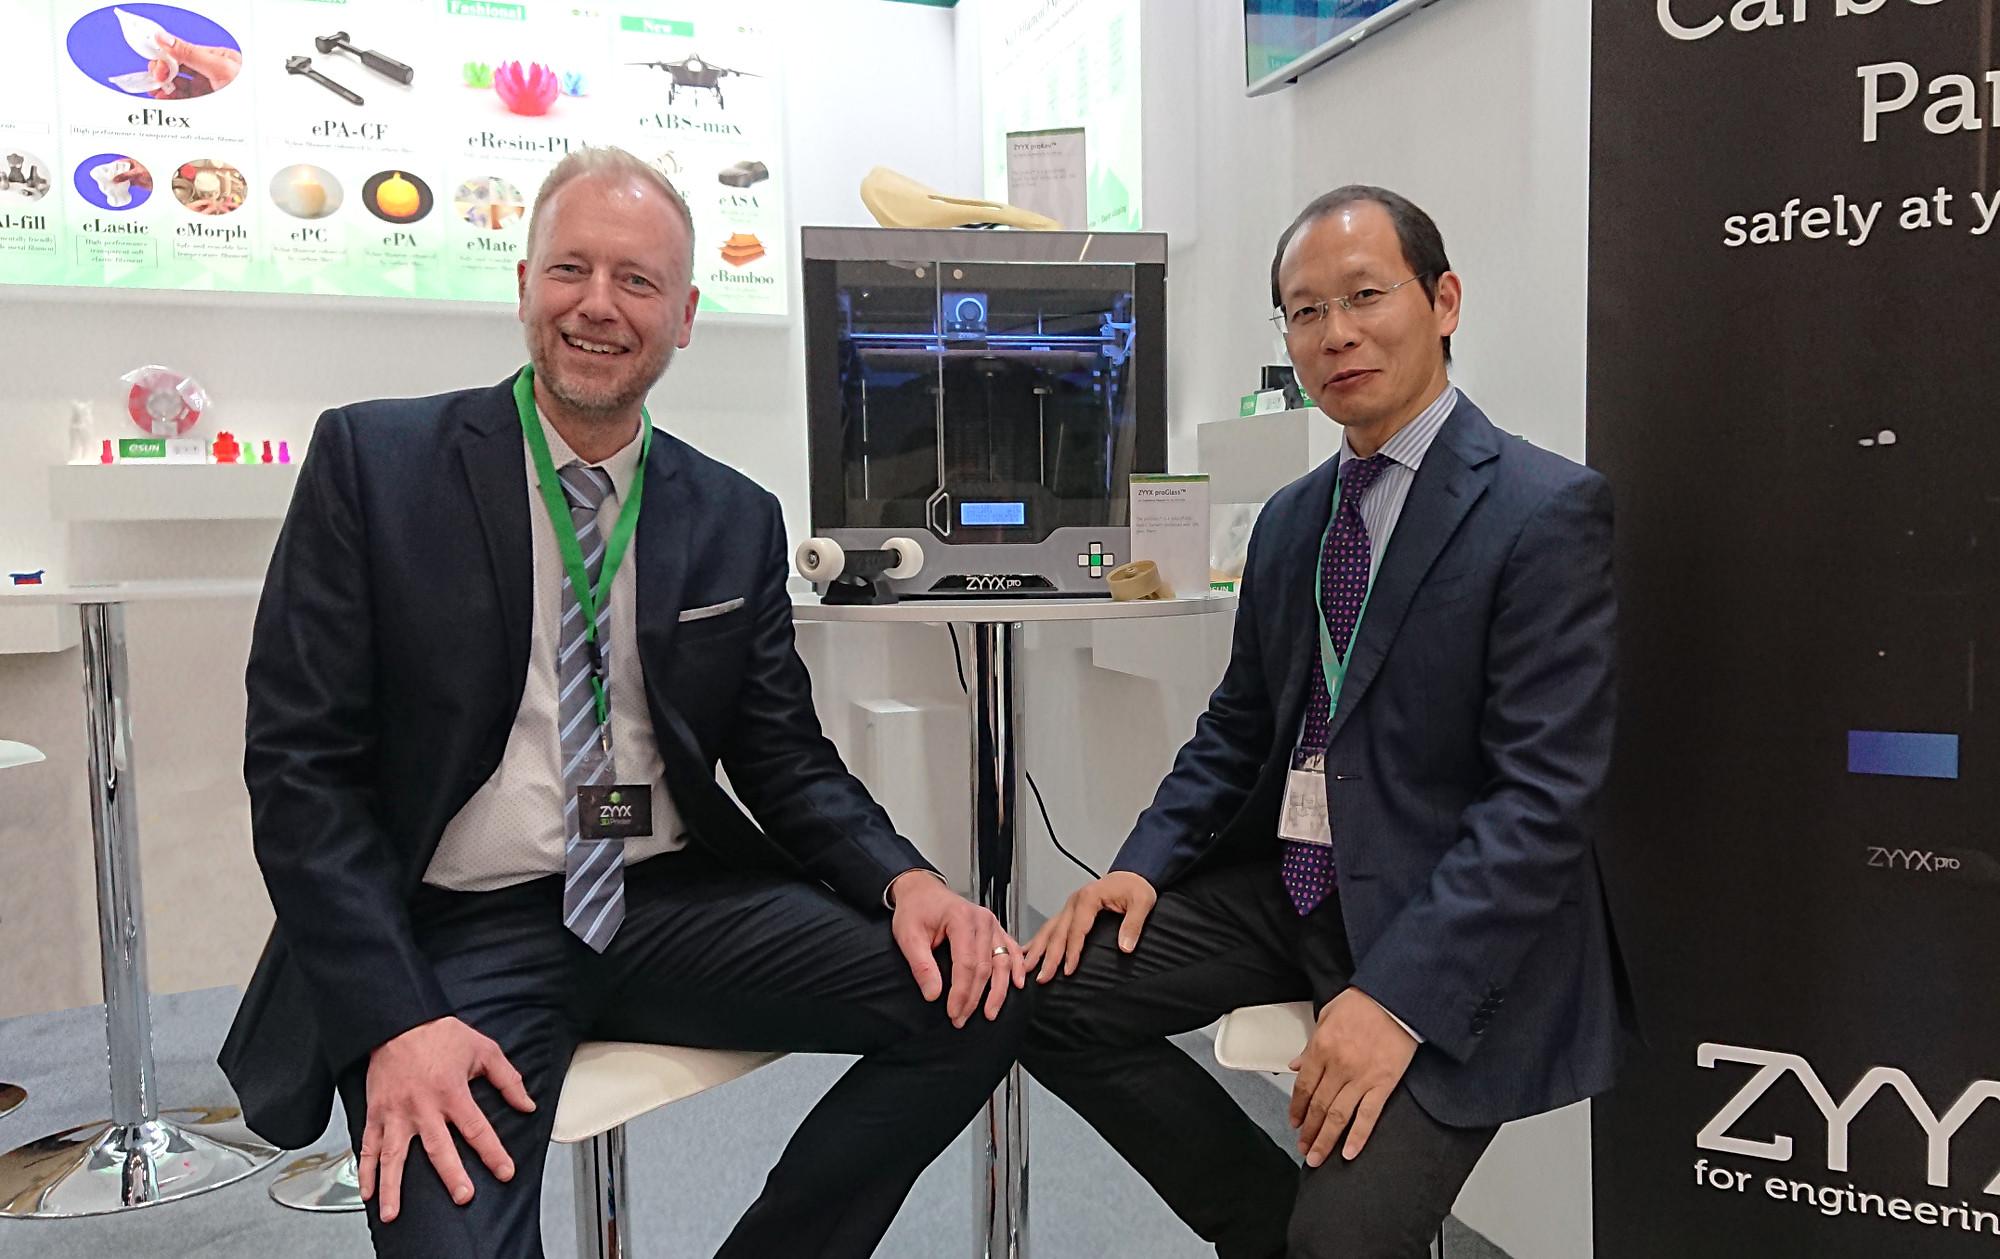 formnext Yang Moosberg - In Kürze: ANSYS kauft 3DSIM, ZYYX & ESUN Partnerschaft, Zentrum für 3D-Bioprinting an UOW